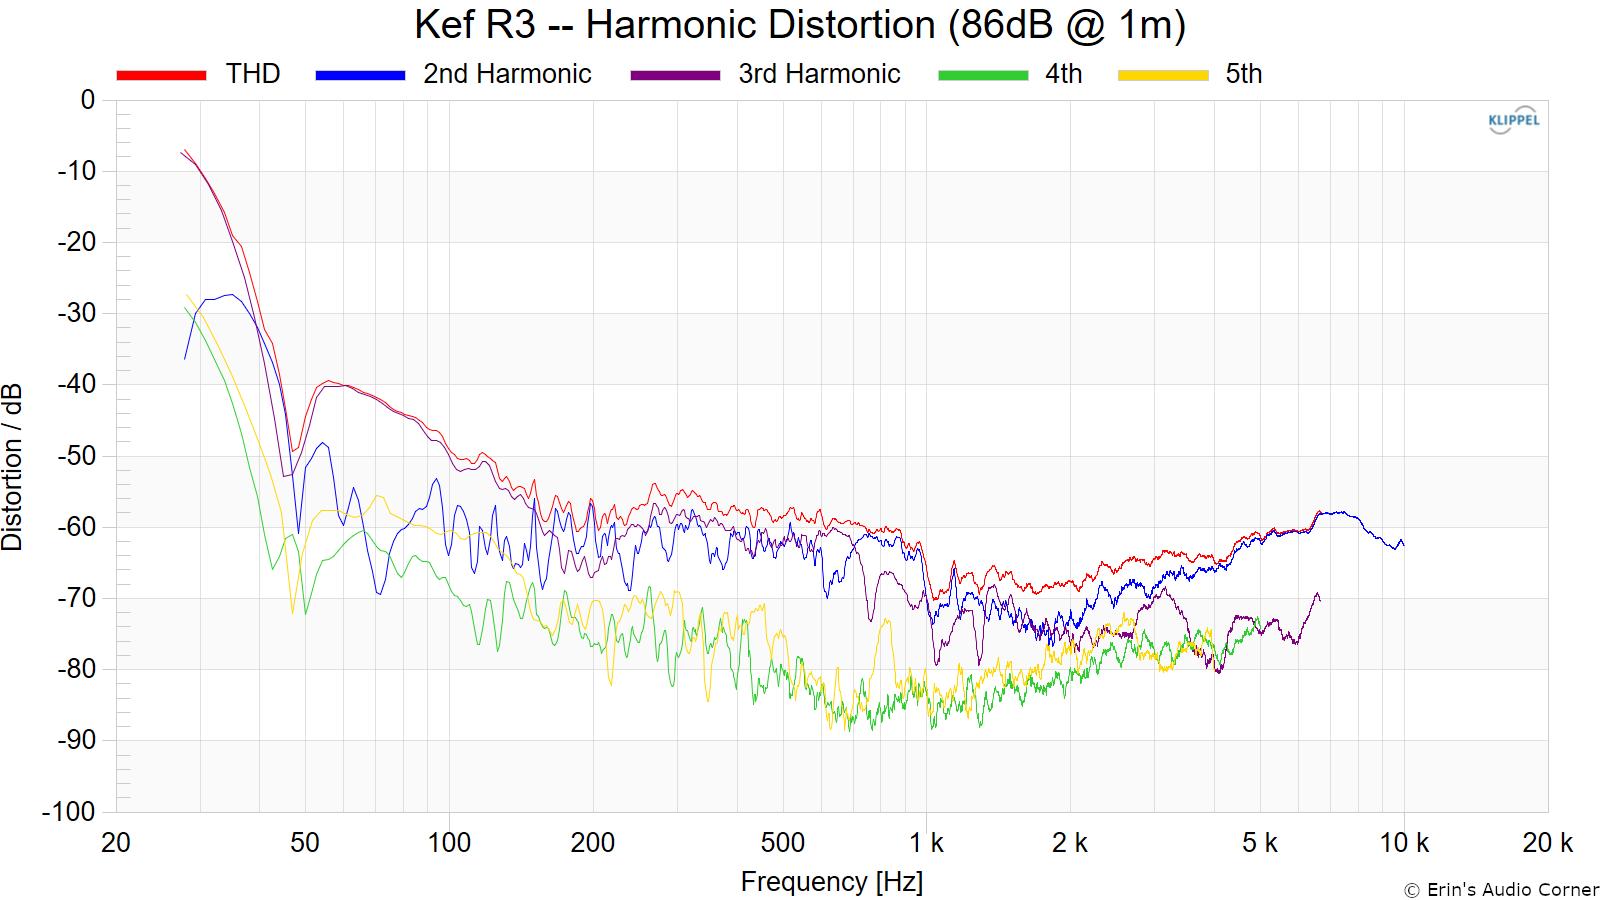 Kef%20R3%20--%20Harmonic%20Distortion%20%2886dB%20%40%201m%29.png